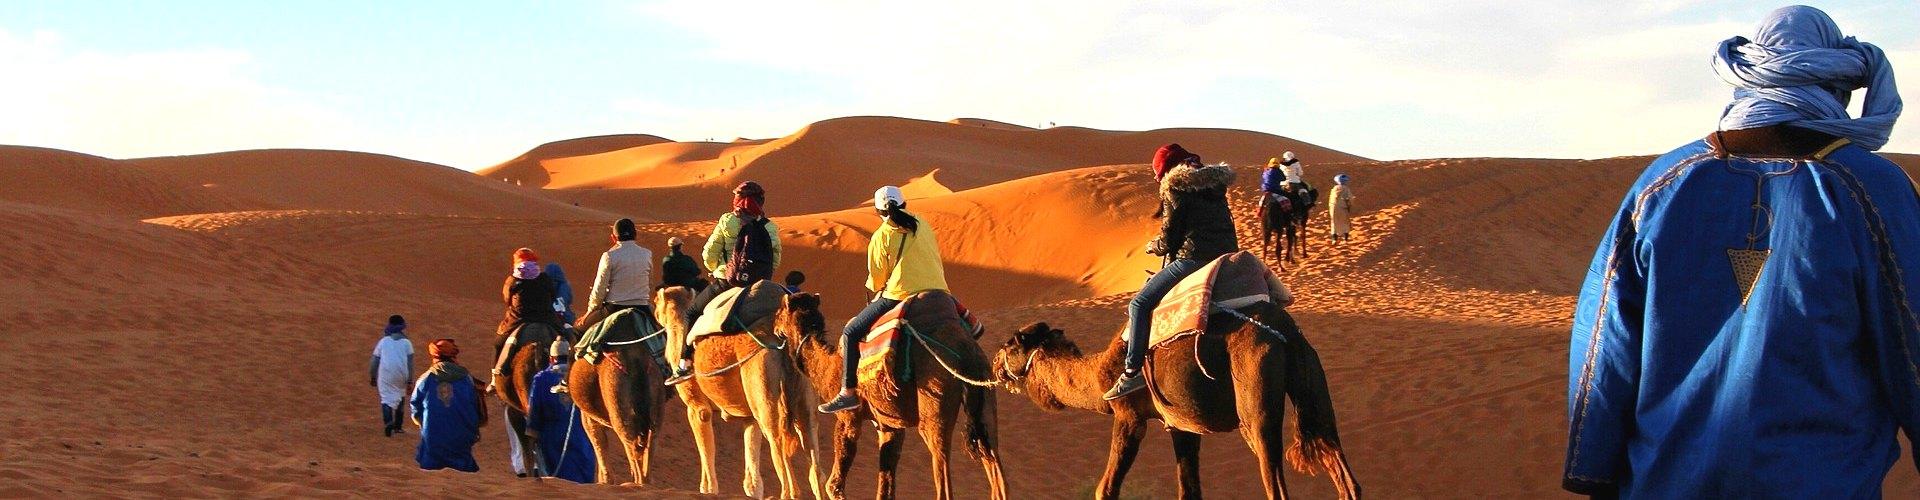 Reisetipps zum Thema: Marokko